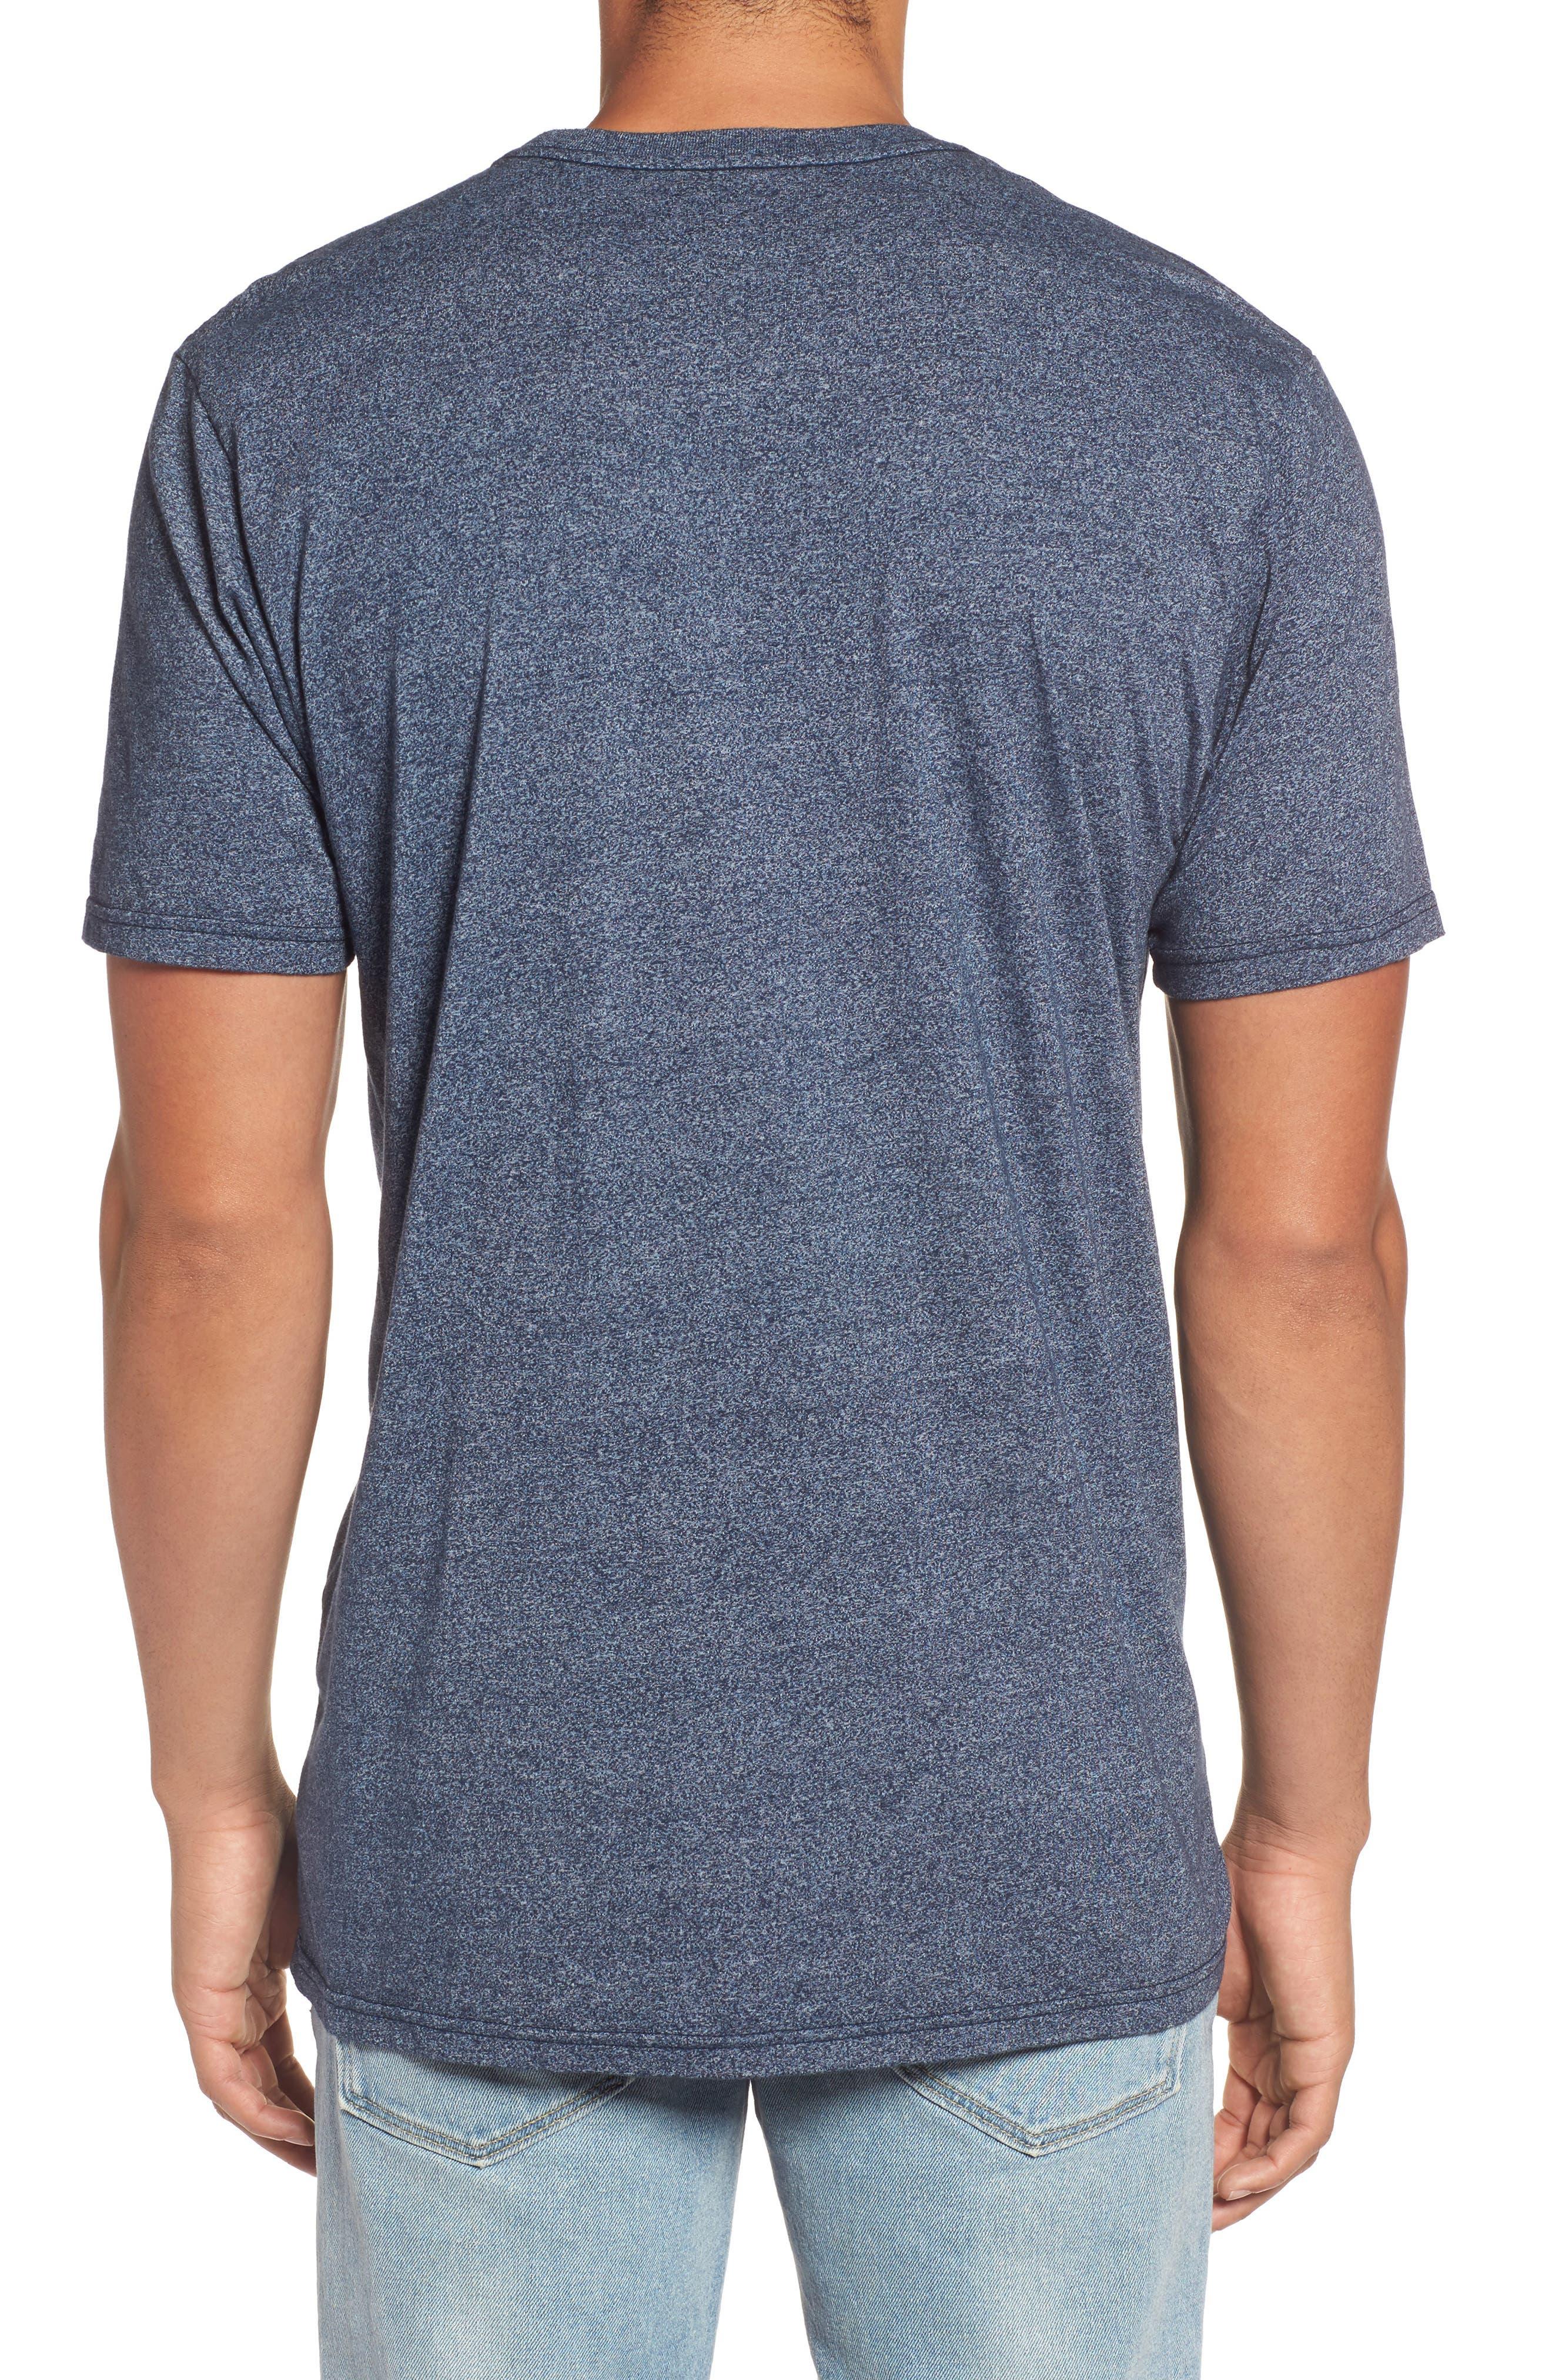 Floater Graphic T-Shirt,                             Alternate thumbnail 2, color,                             410